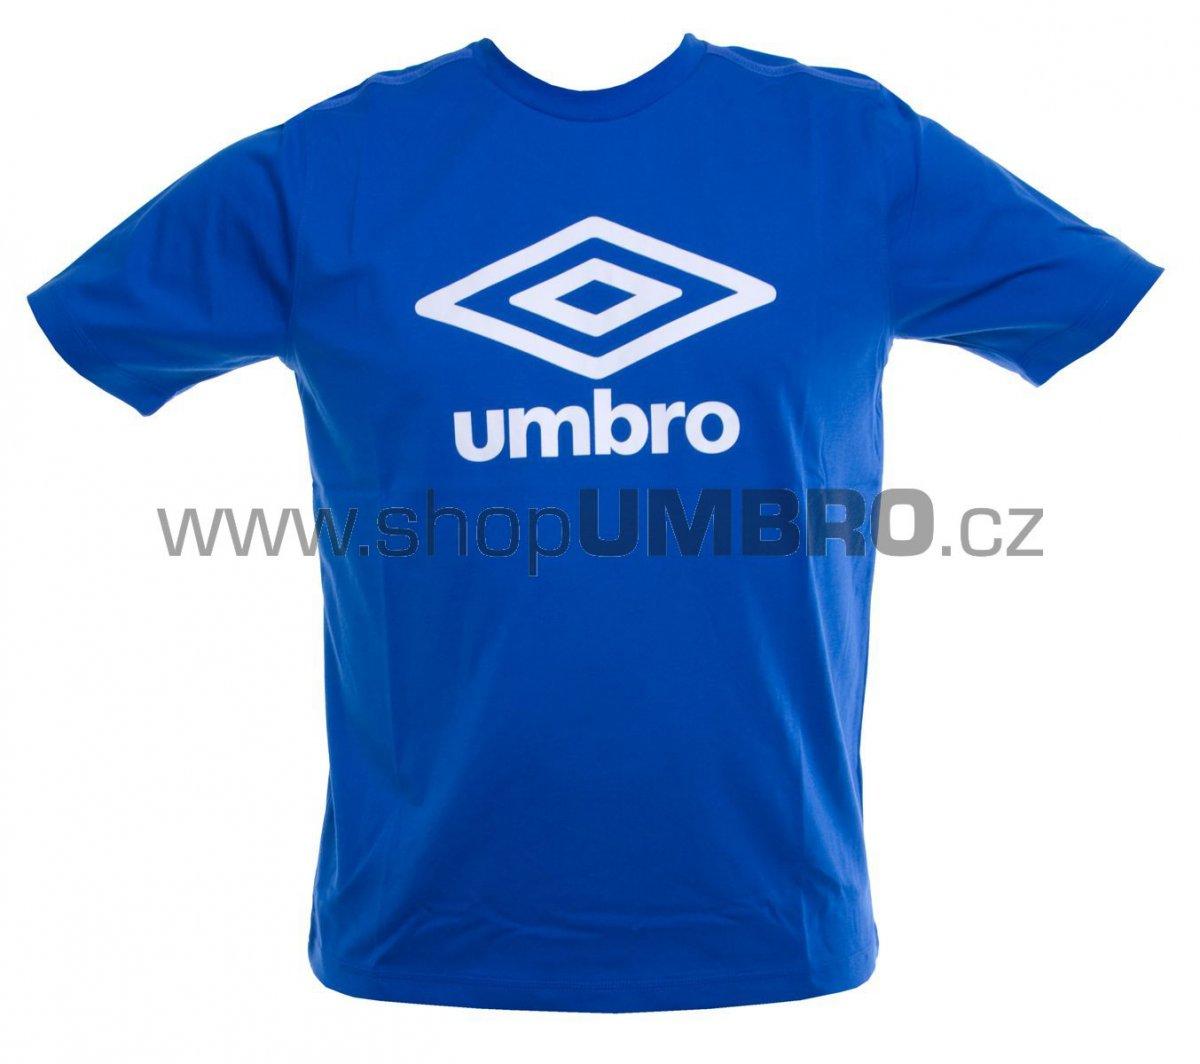 Umbro Triko TRNG FETTES modro-bílé junior - Trika